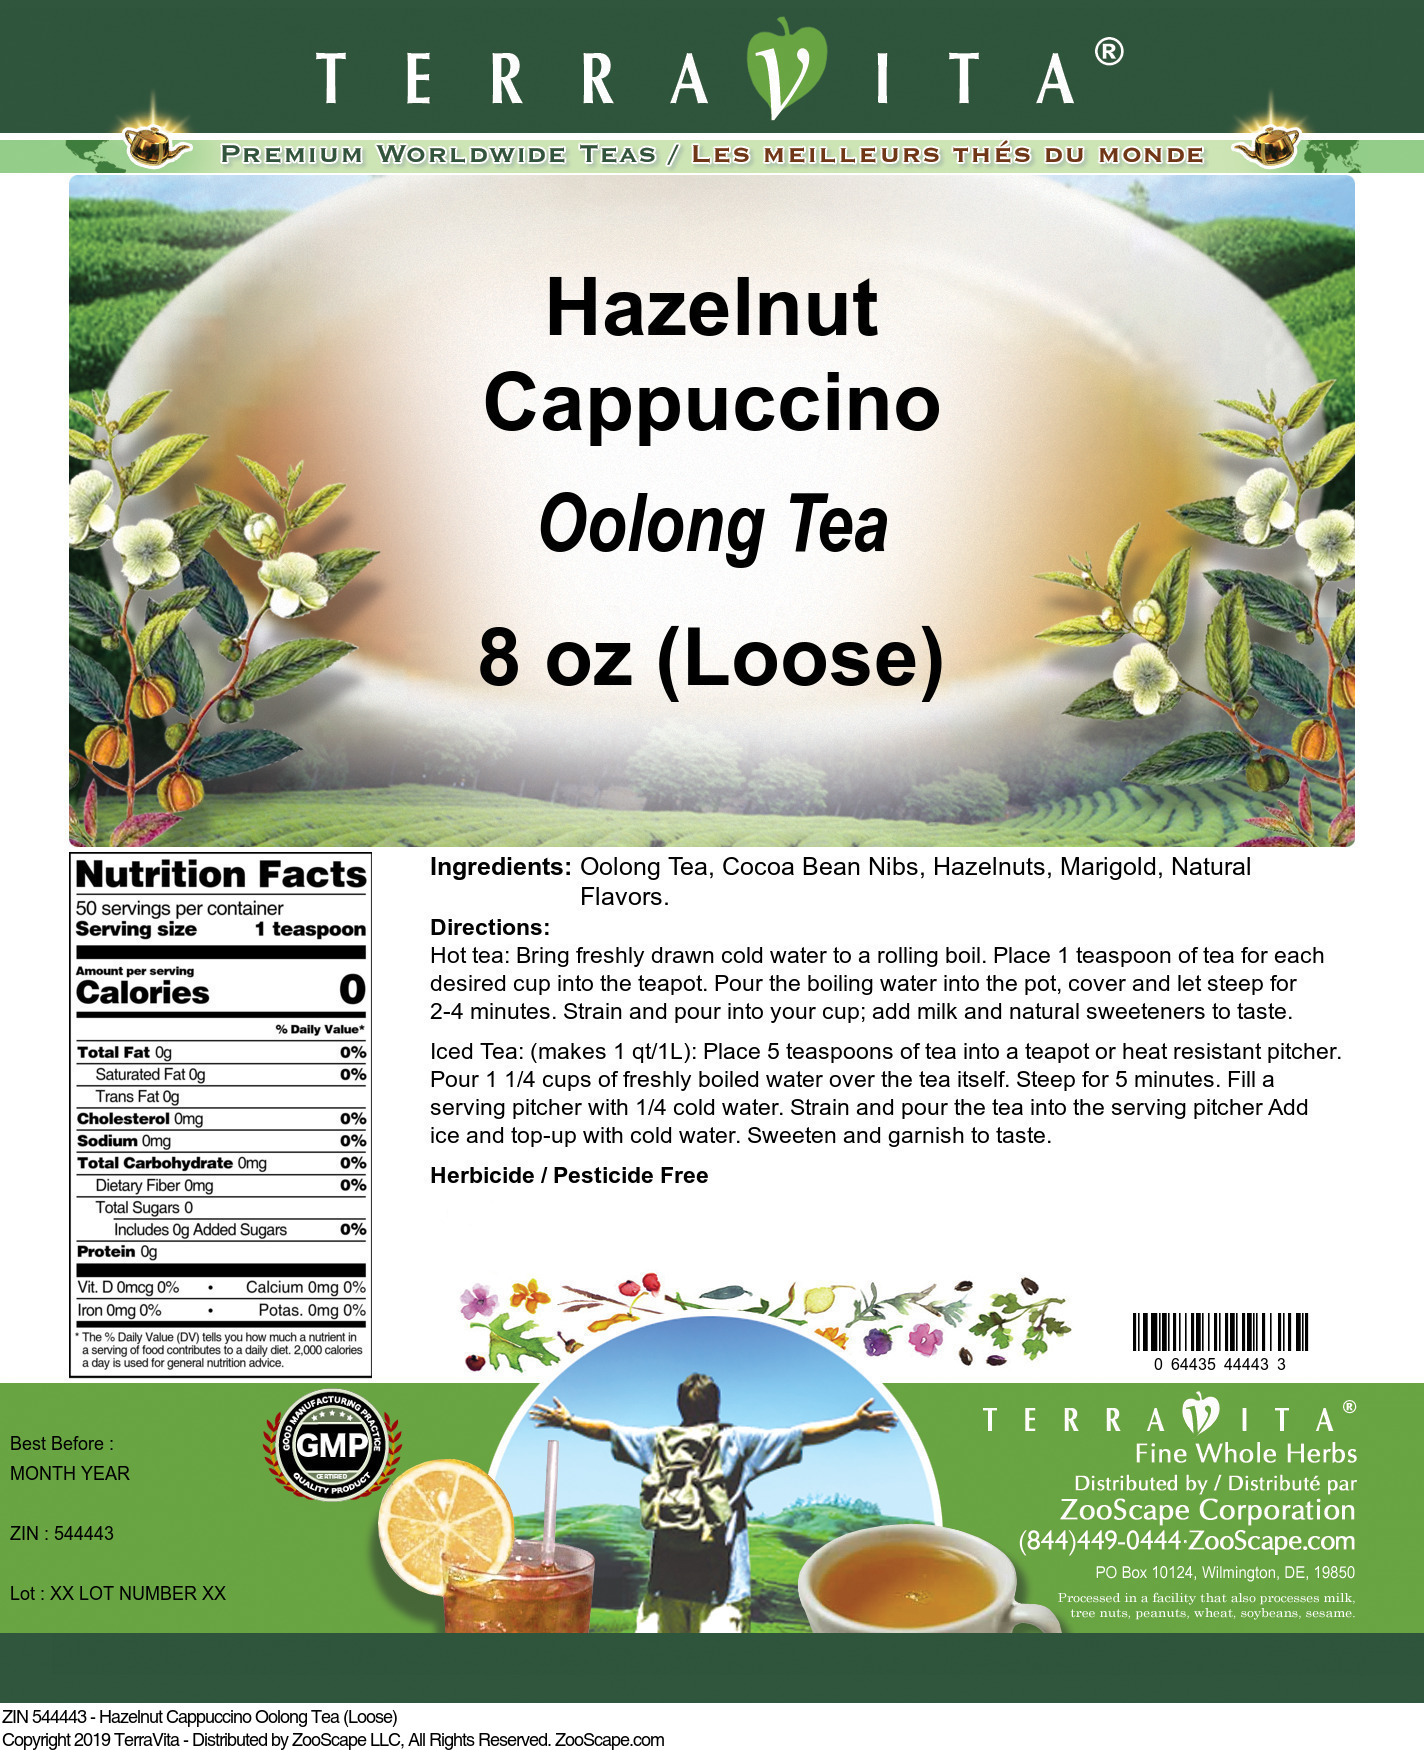 Hazelnut Cappuccino Oolong Tea (Loose)